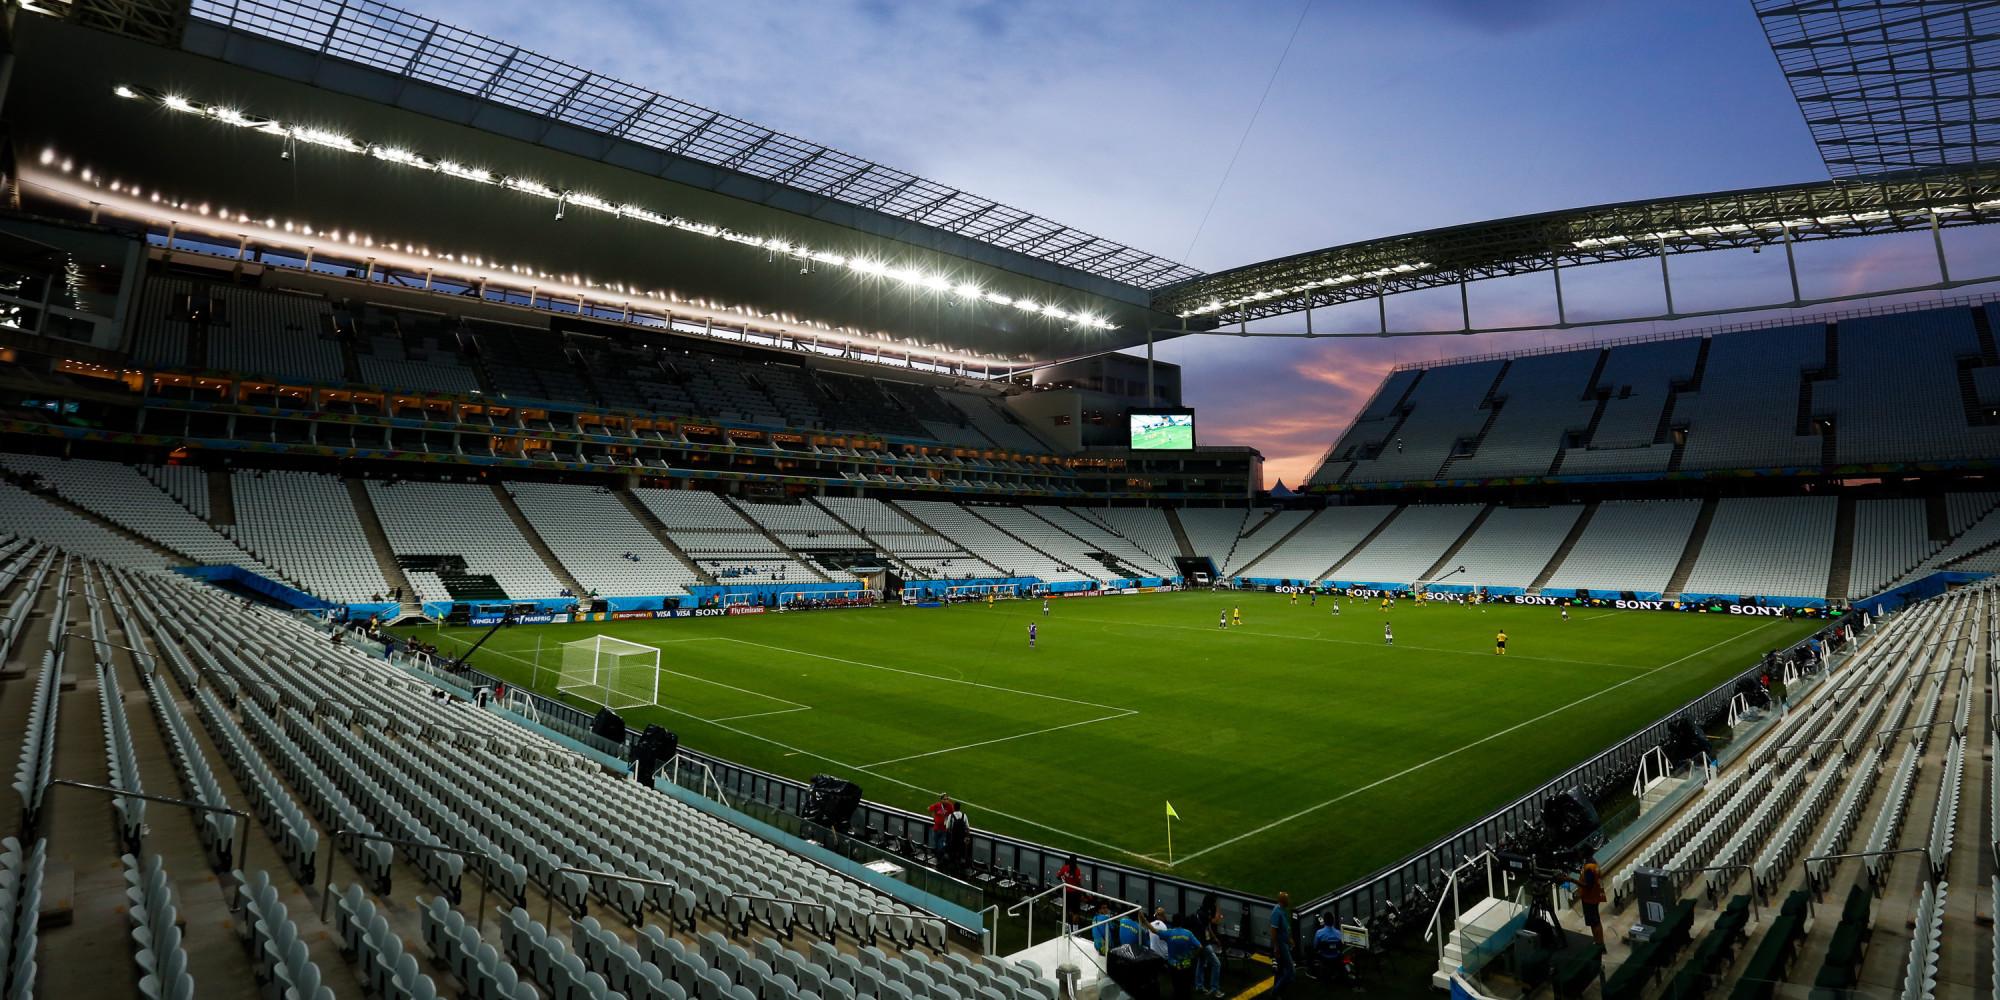 Fotos Corinthians ~ World Cup 2014 S u00e3o Paulo Stadium Would Not Pass British Safety Test